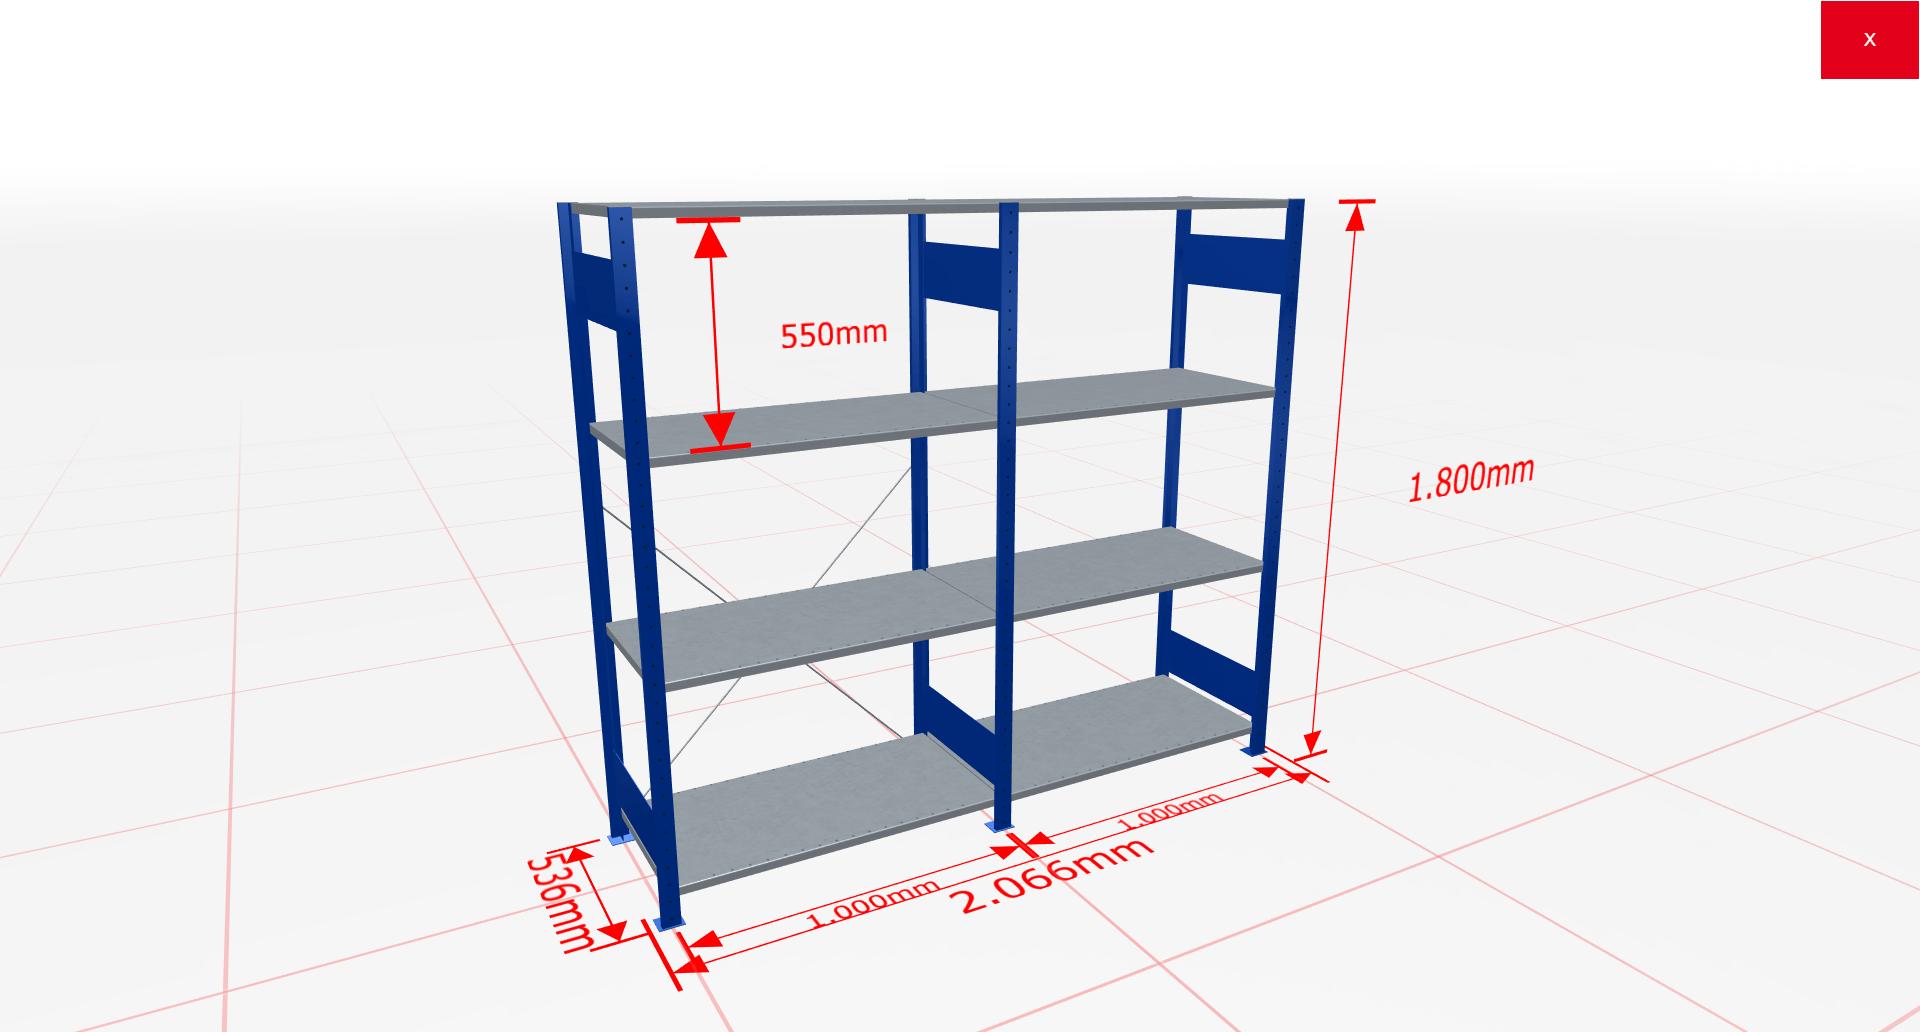 Fachbodenregal Komplettregal 1800x2066x500 mm (HxBxT) SCHULTE Lagertechnik blau 4 Ebenen  150 kg je Boden